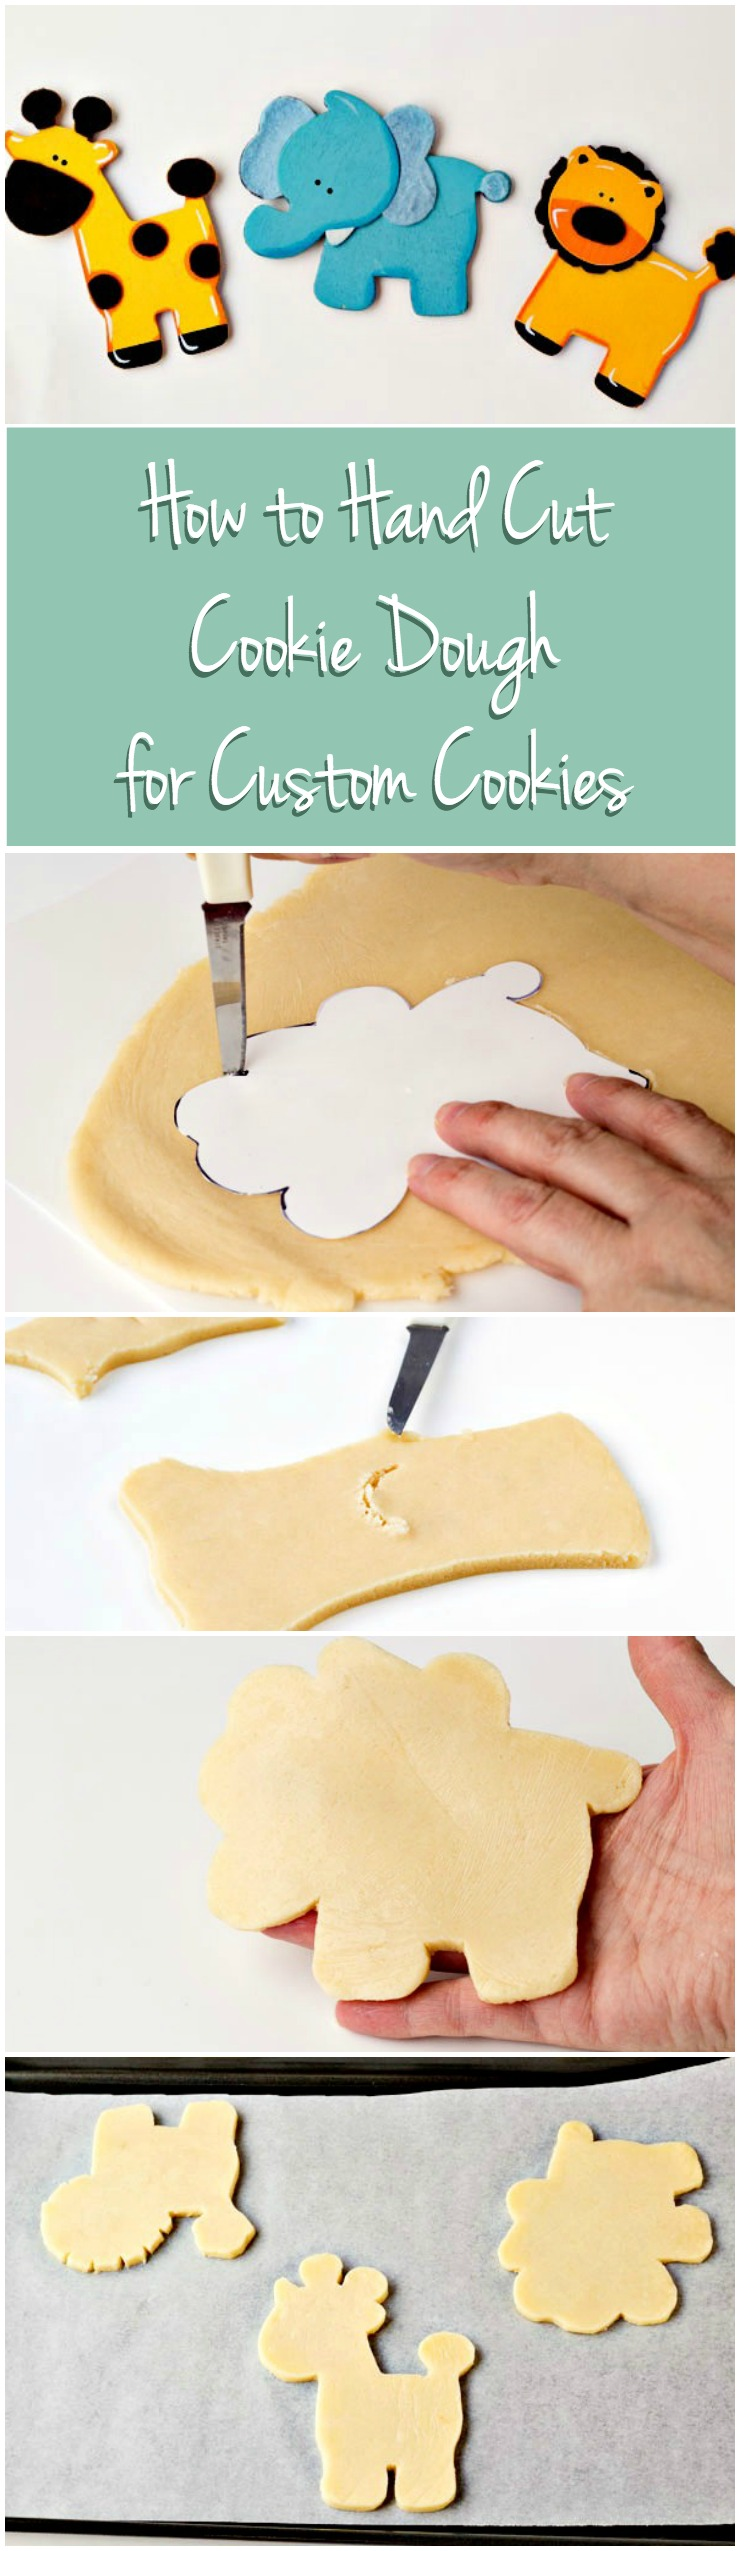 How to Hand Cut Cookie Dough | The Bearfoot Baker